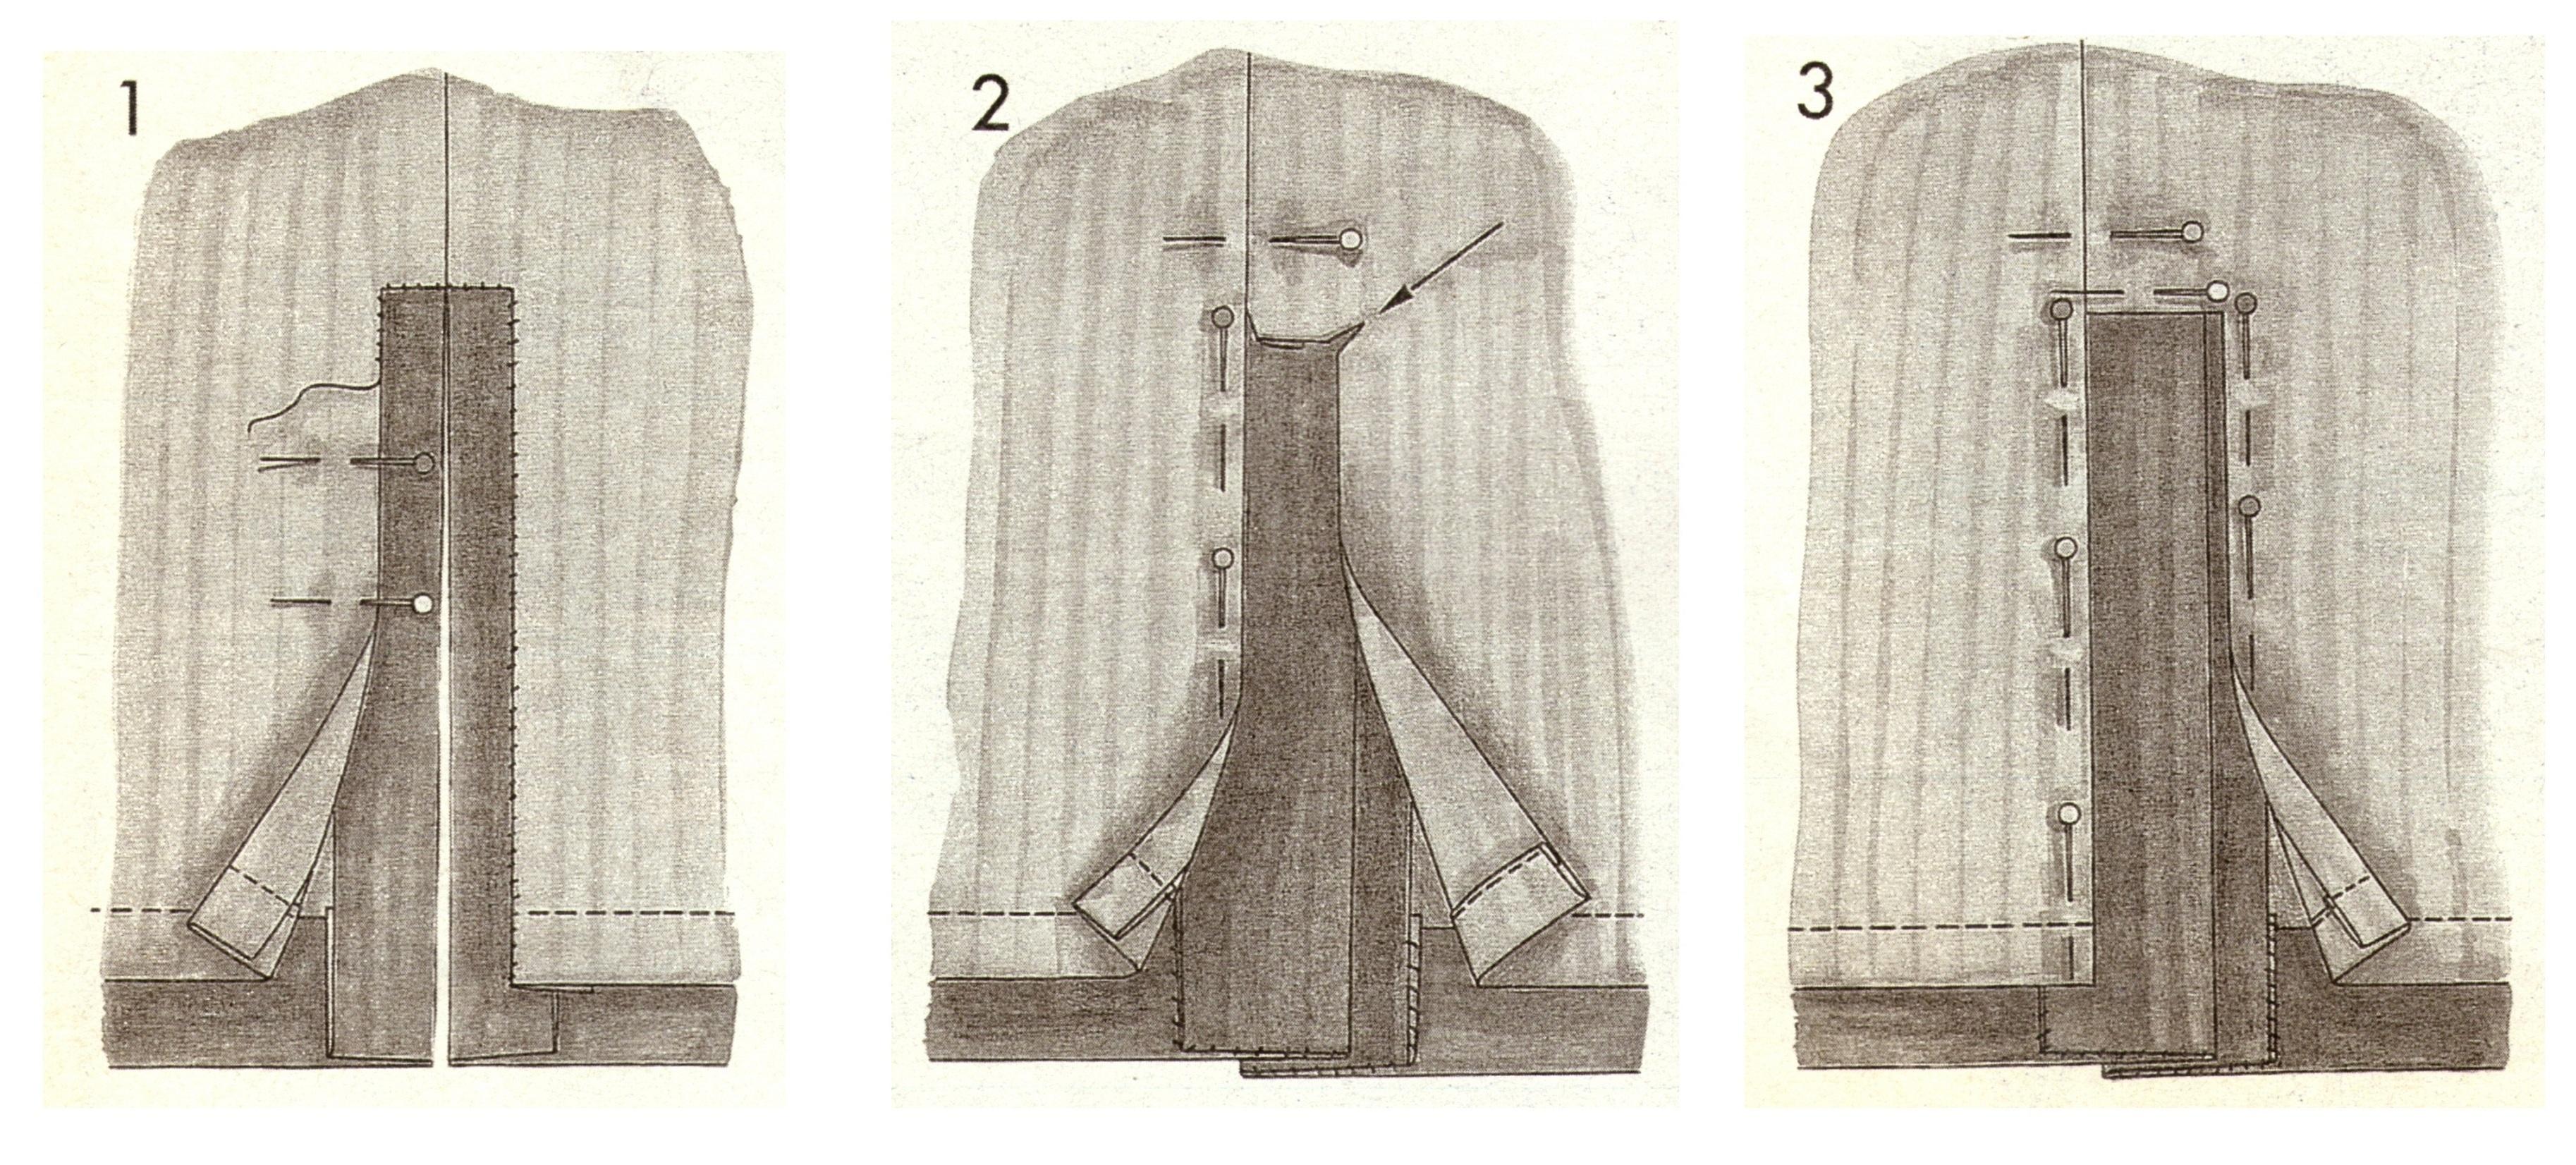 Обработка шлицы юбки карандаш